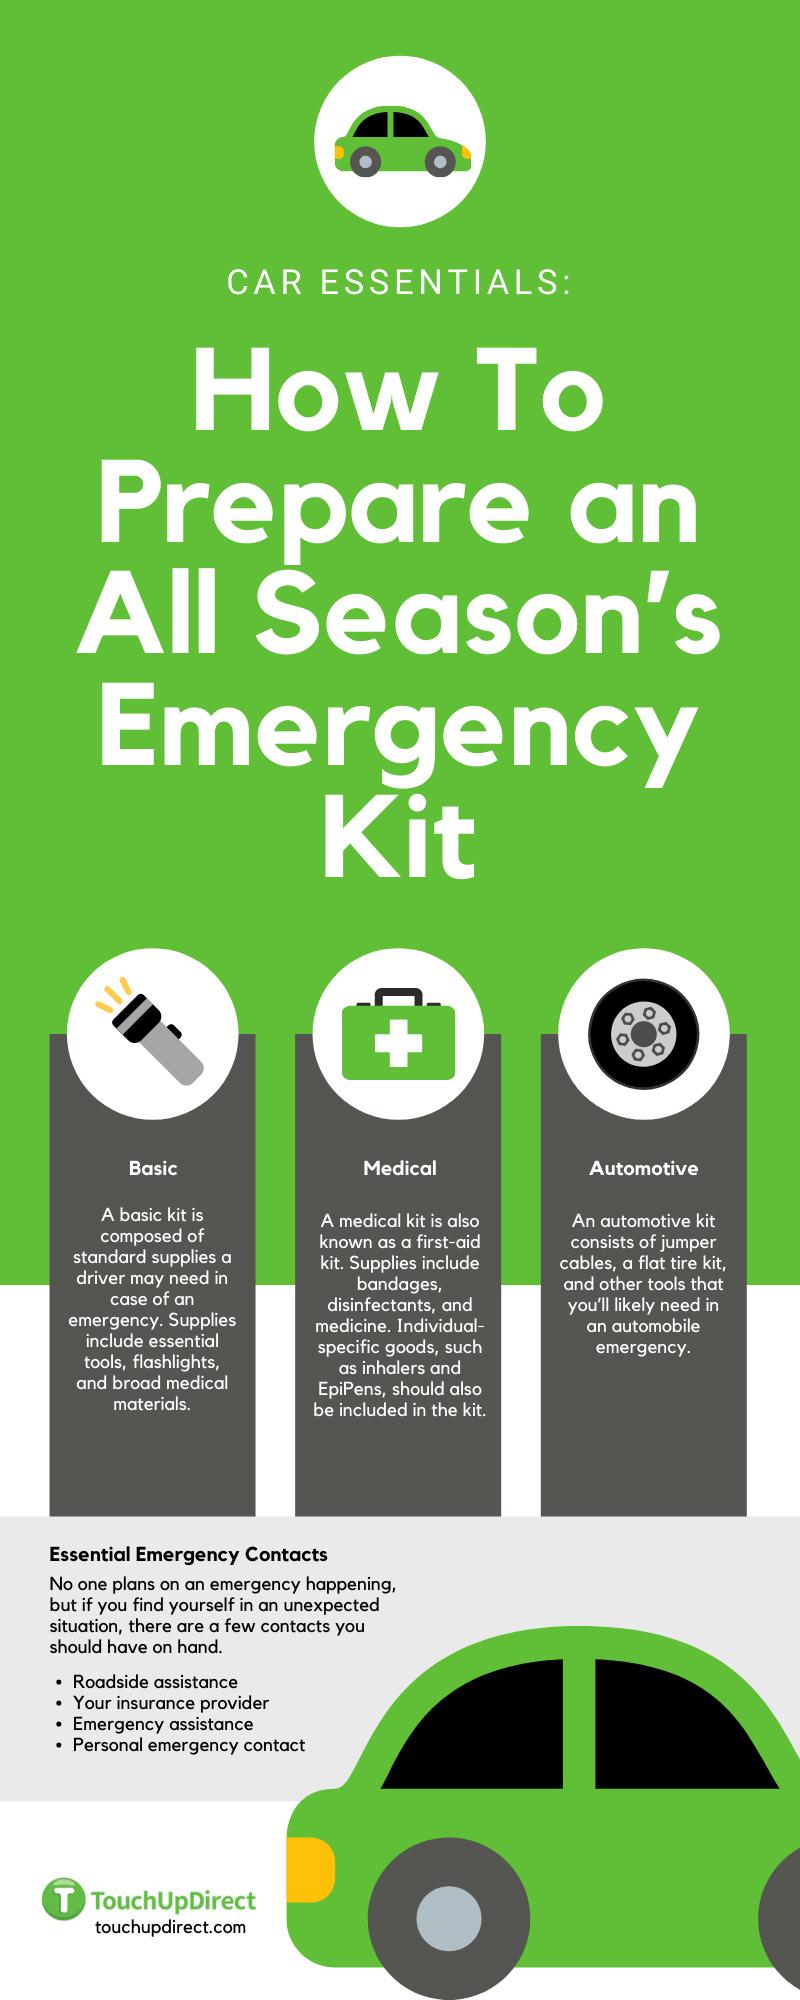 Car Essentials: How To Prepare an All Seasons Emergency Kit